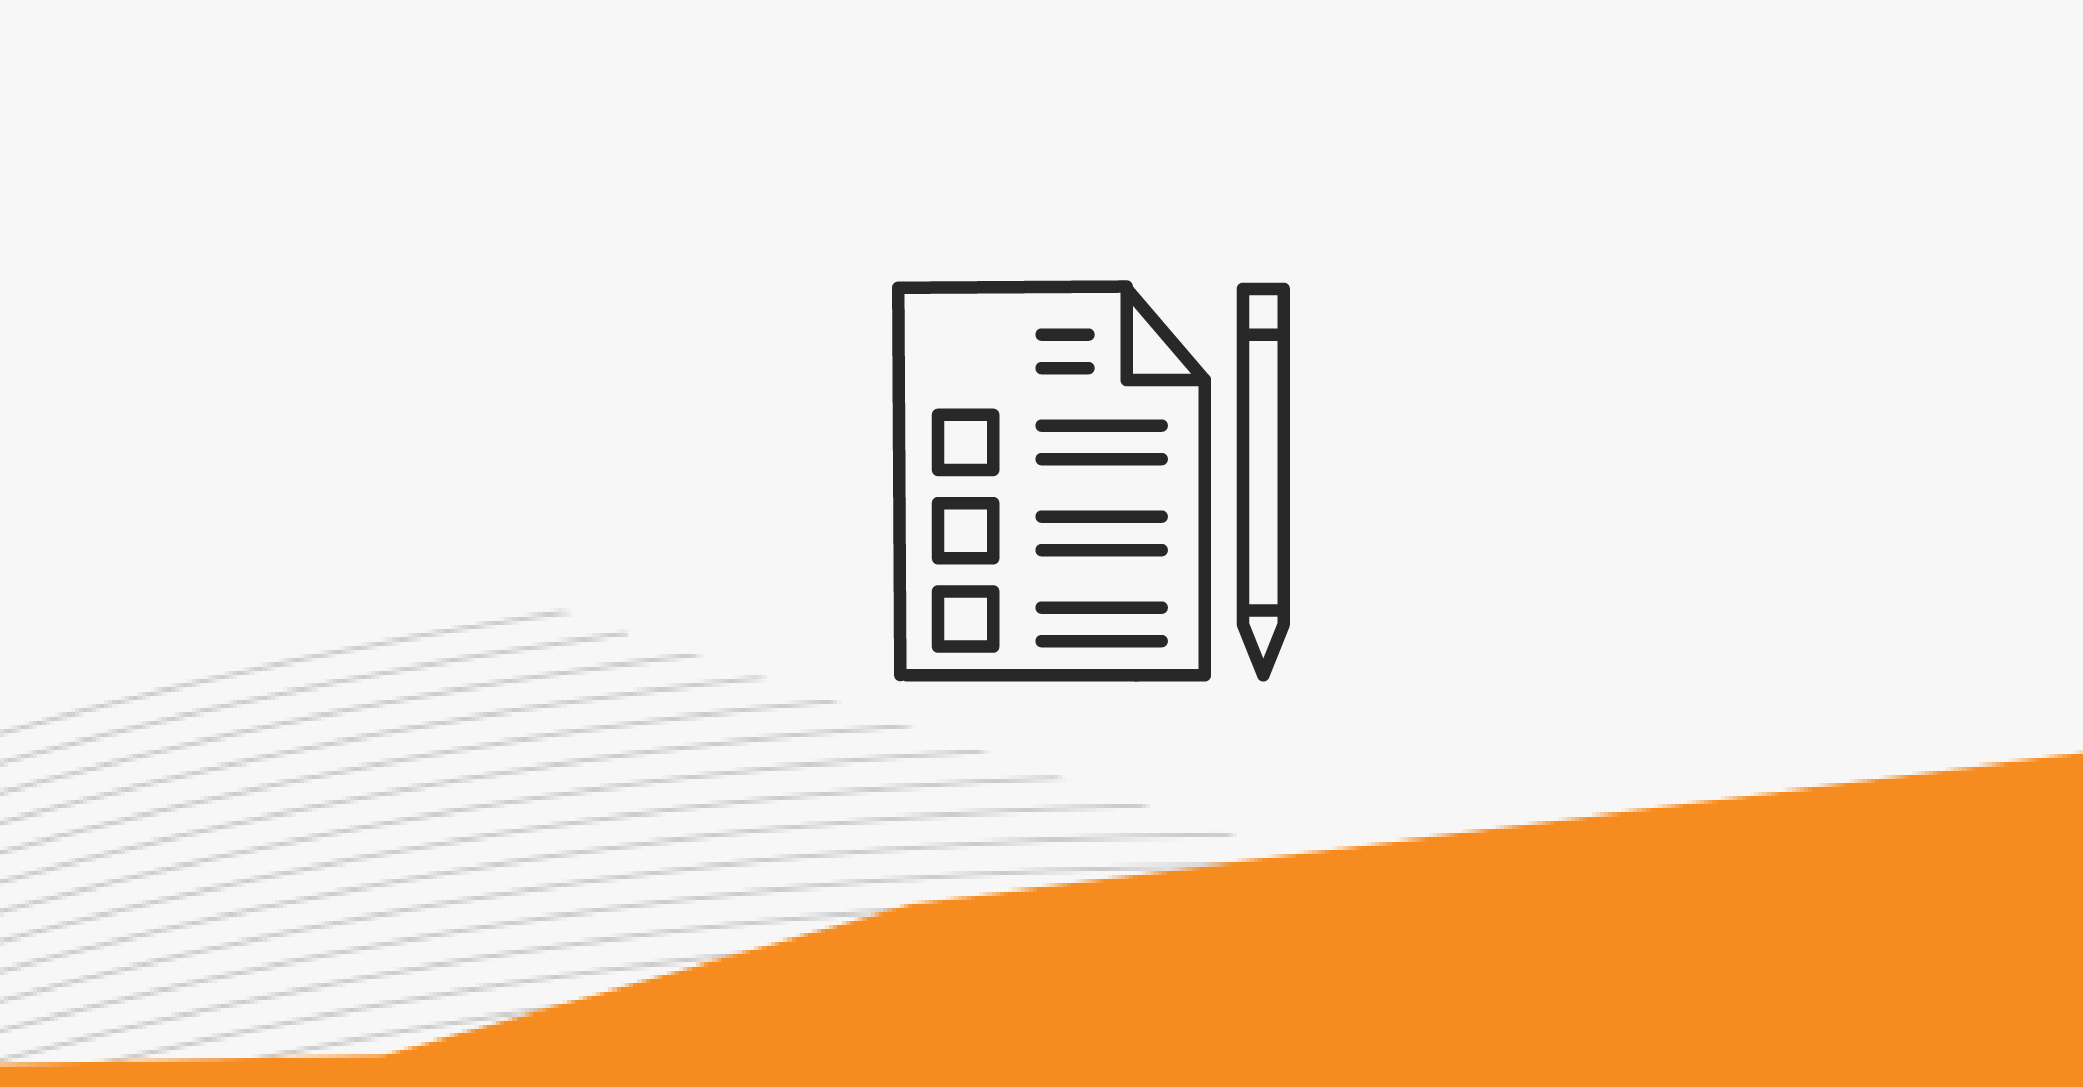 Admin - How to Create Carrier Log Edits